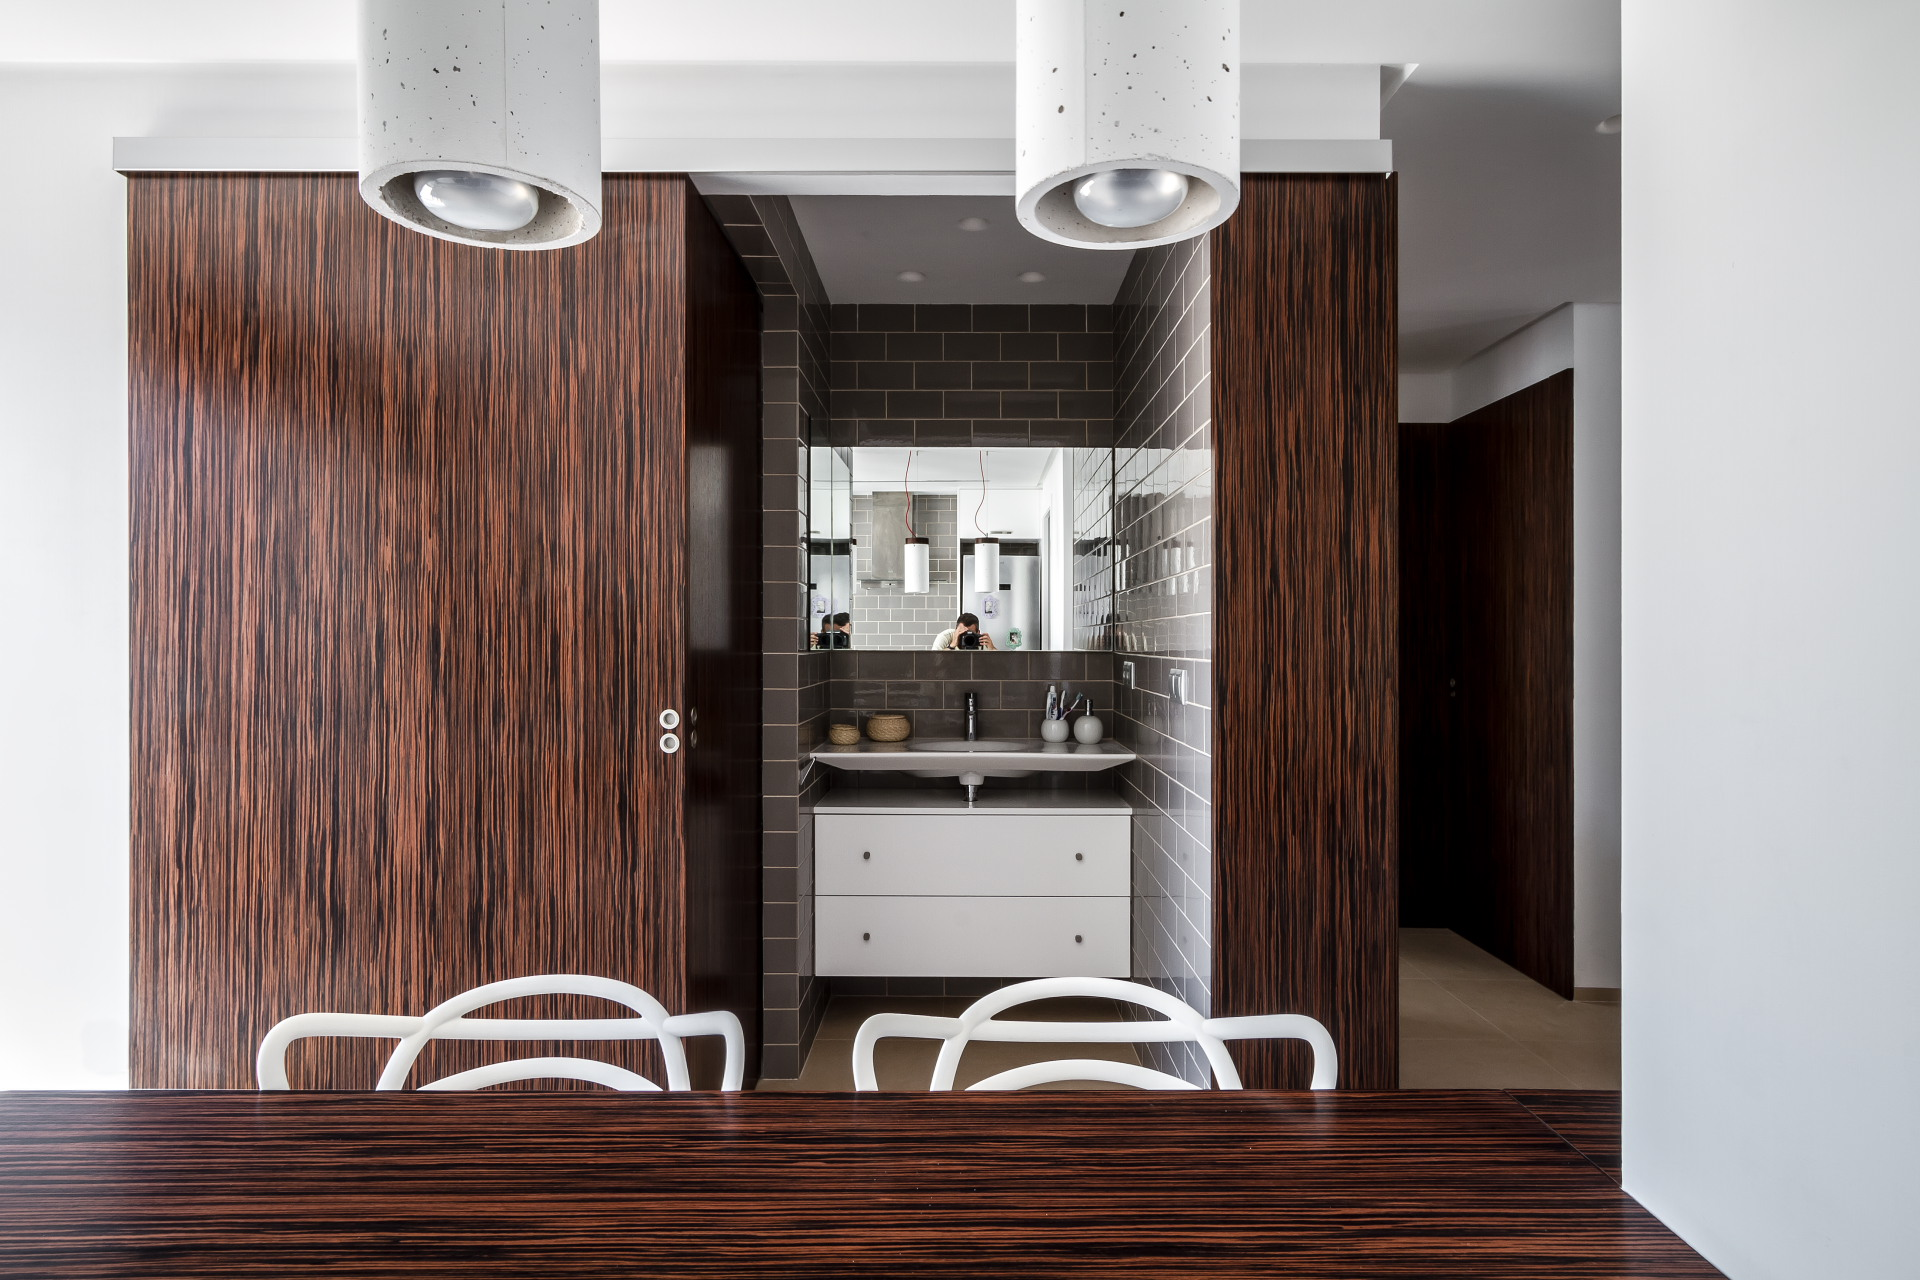 fotografia-arquitectura-valencia-german-cabo-selecta-home-denia (8)